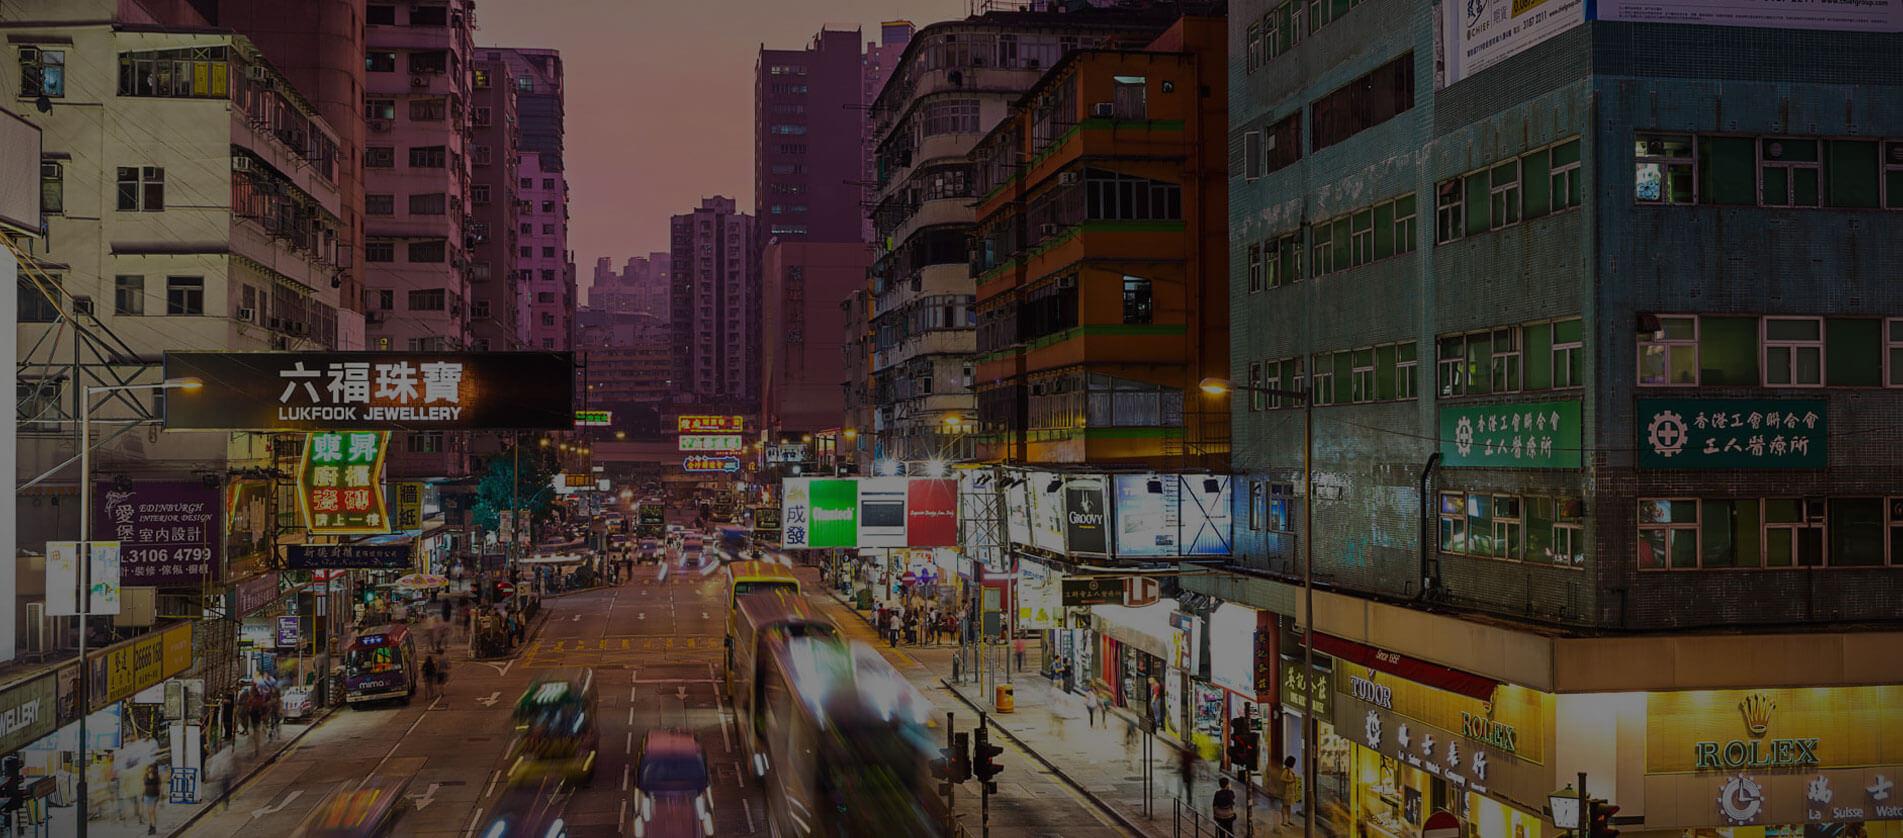 Dorsett Mongkok - Why Book With Us